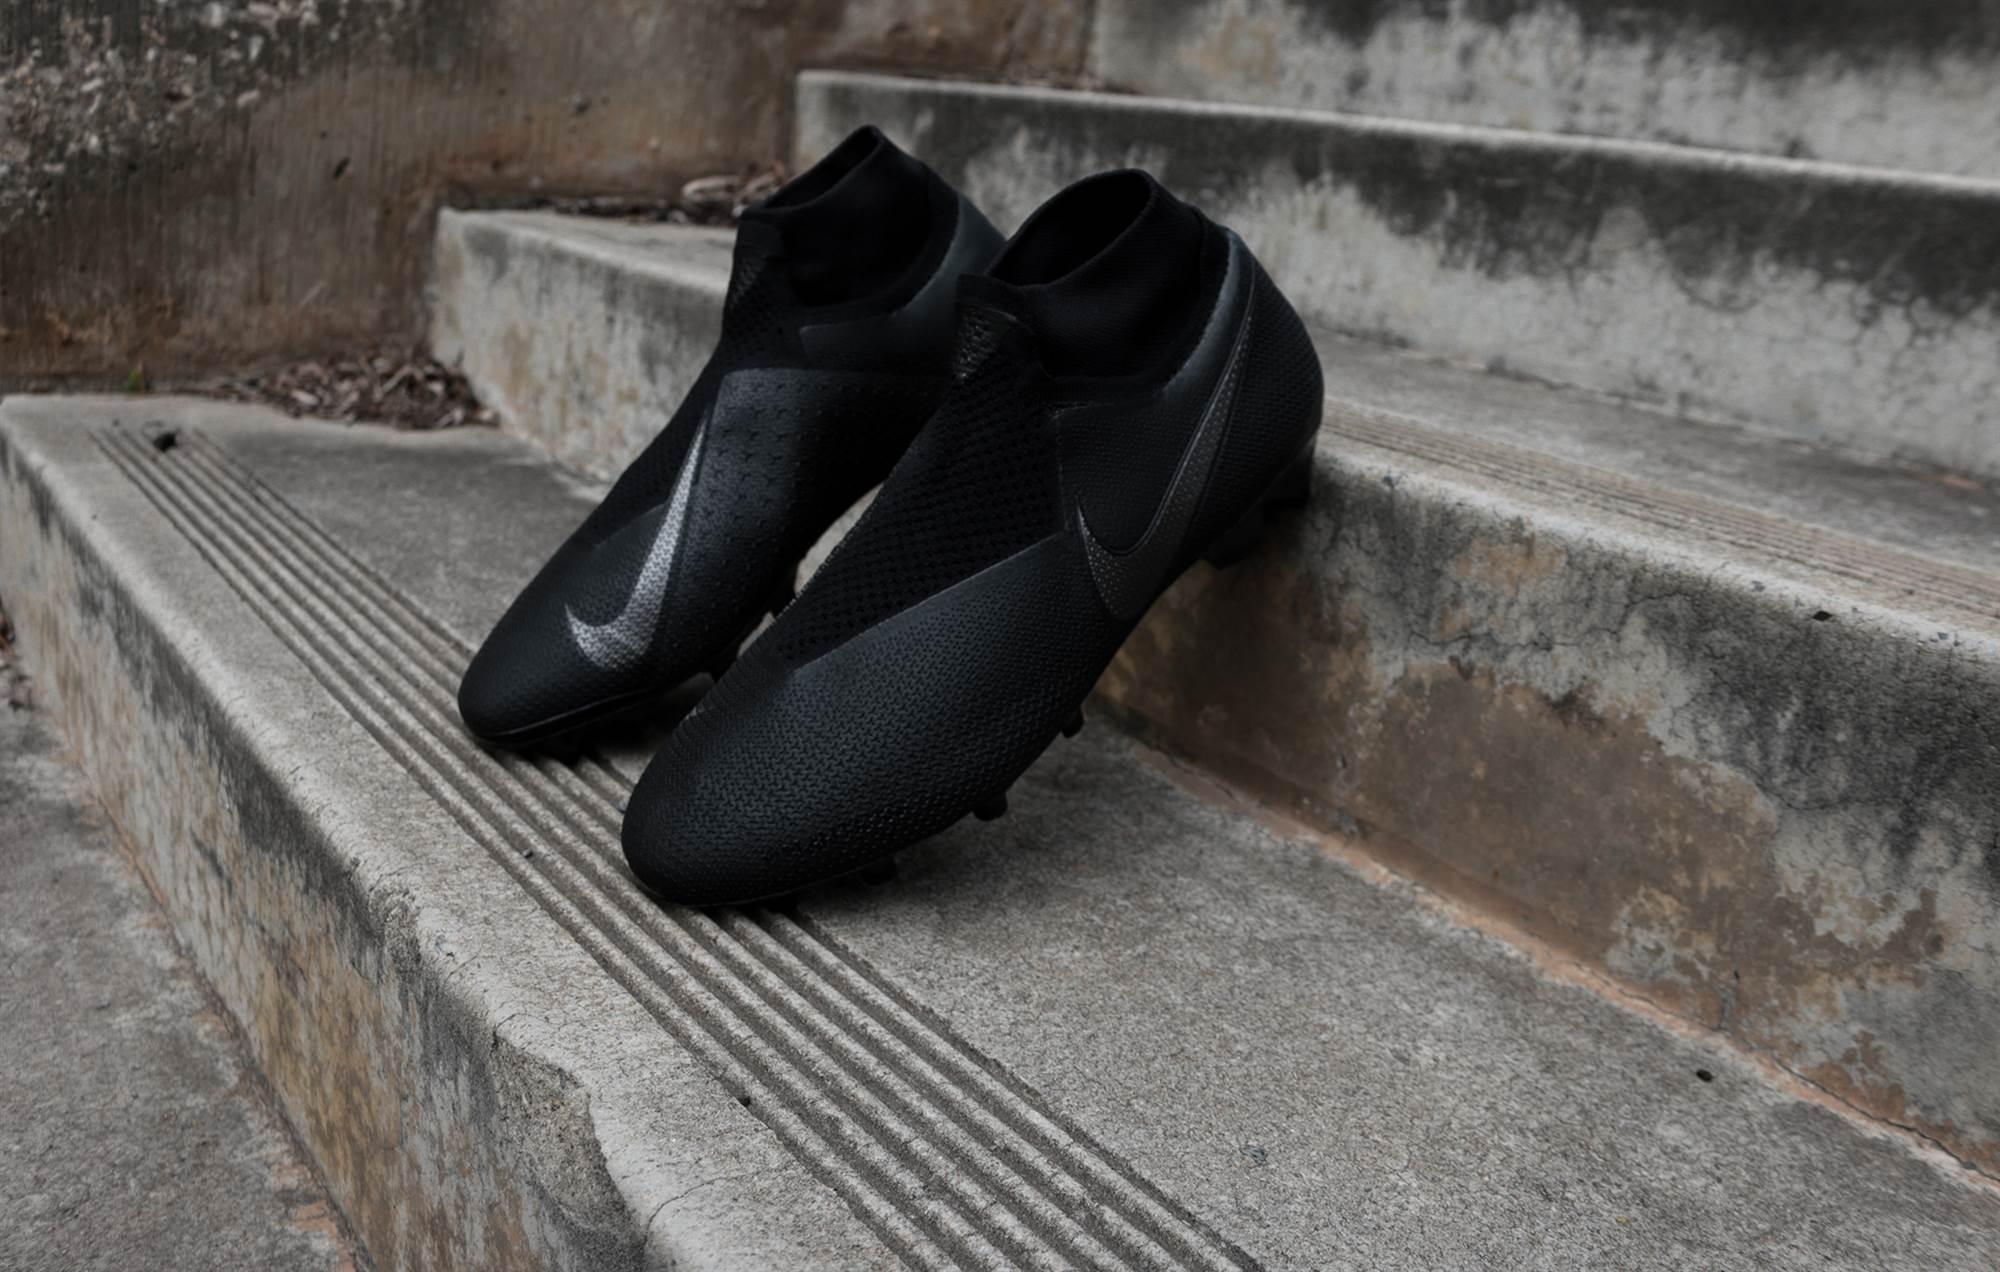 356547d59 Nike drop